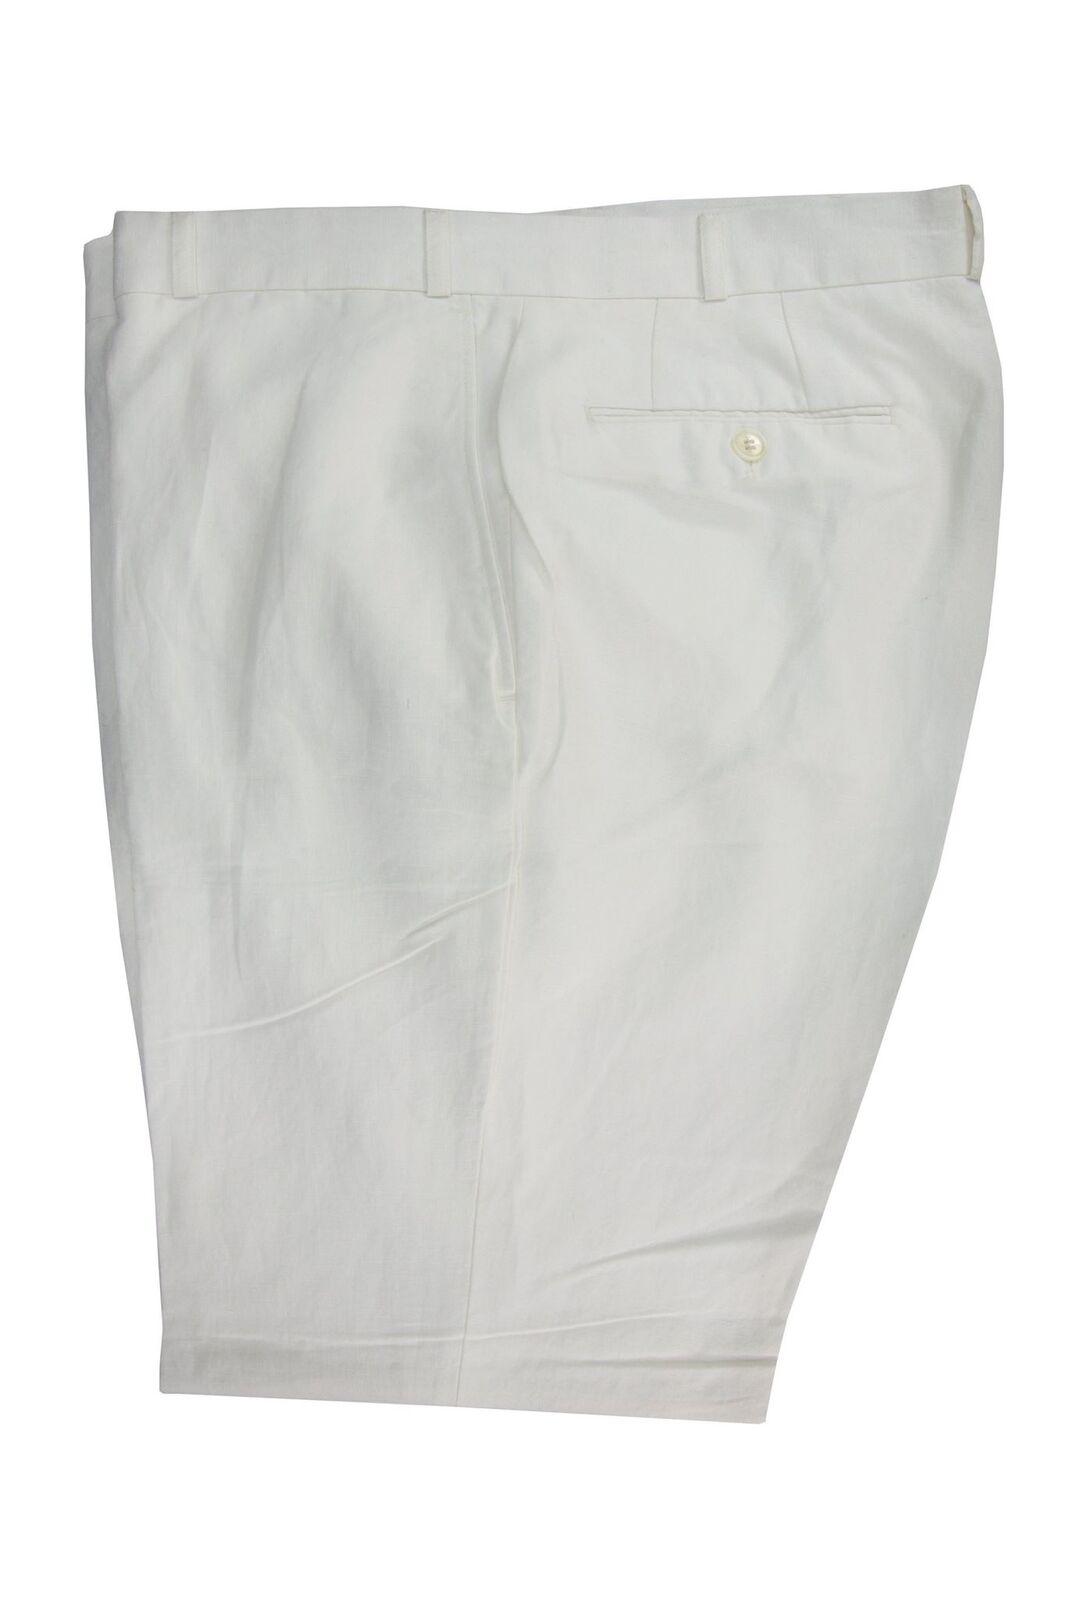 Odermark off-Weiß linen trousers Größe 38 90 DV5